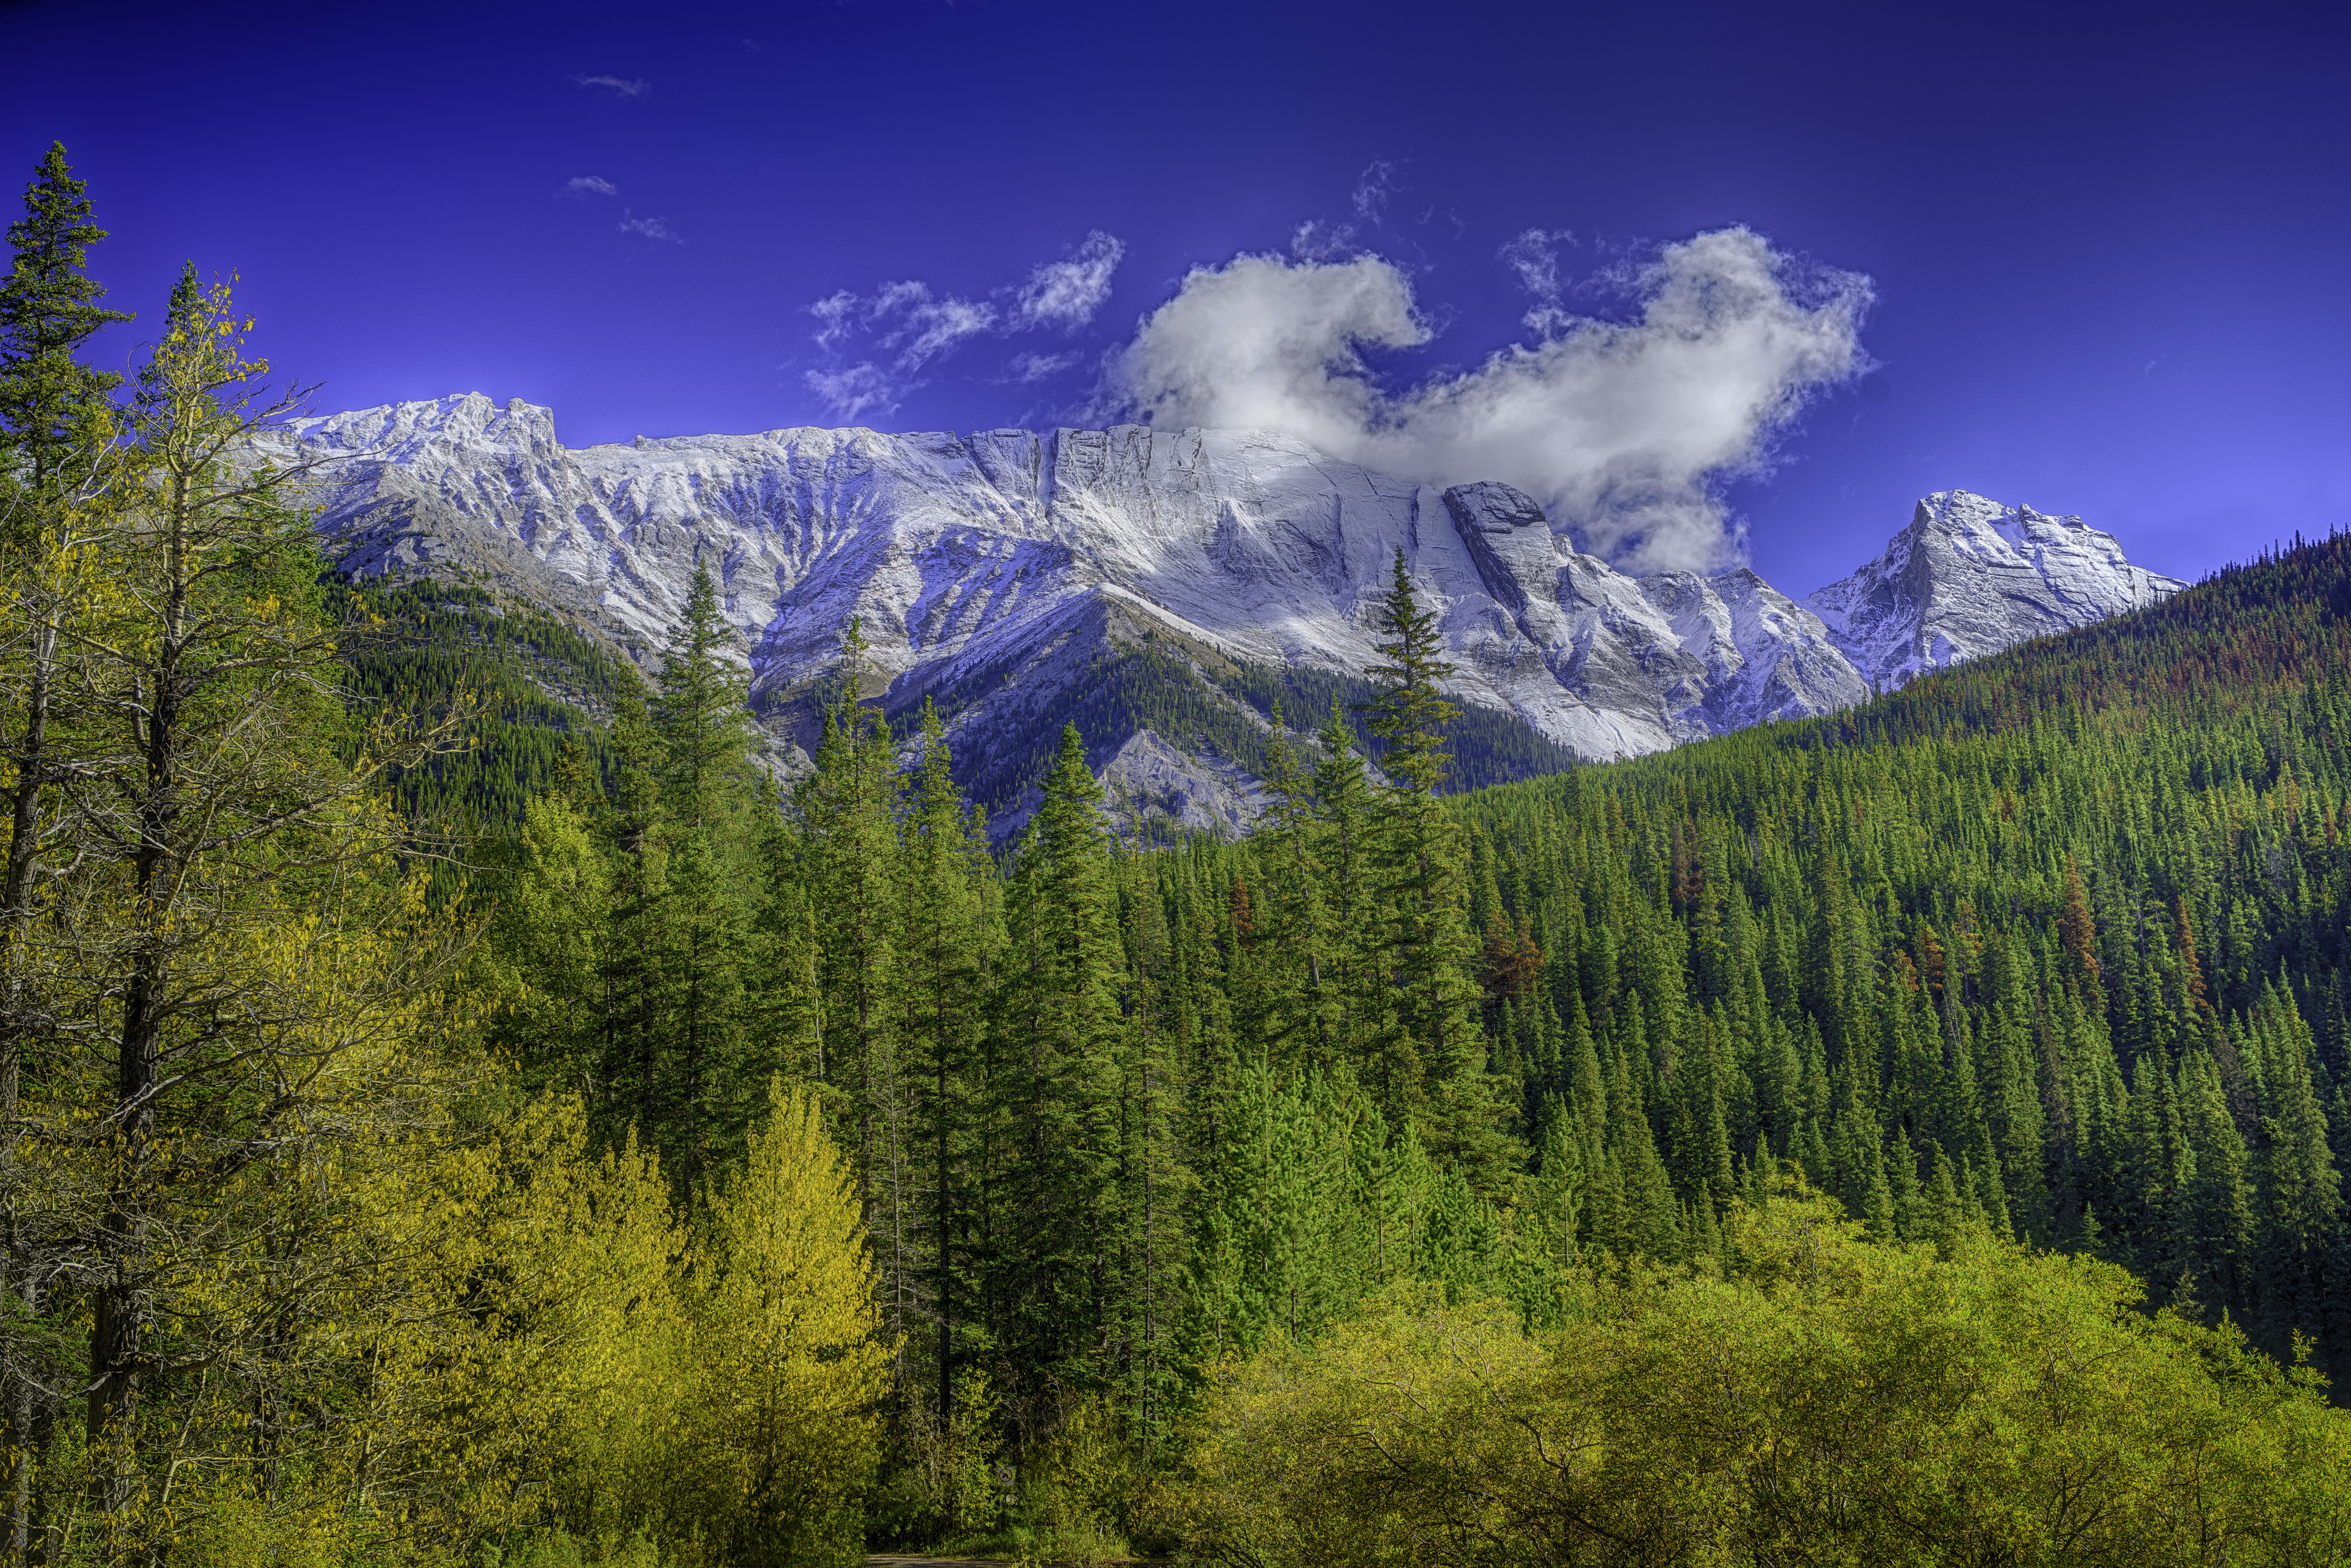 Queen Elizabeth Range, Canada